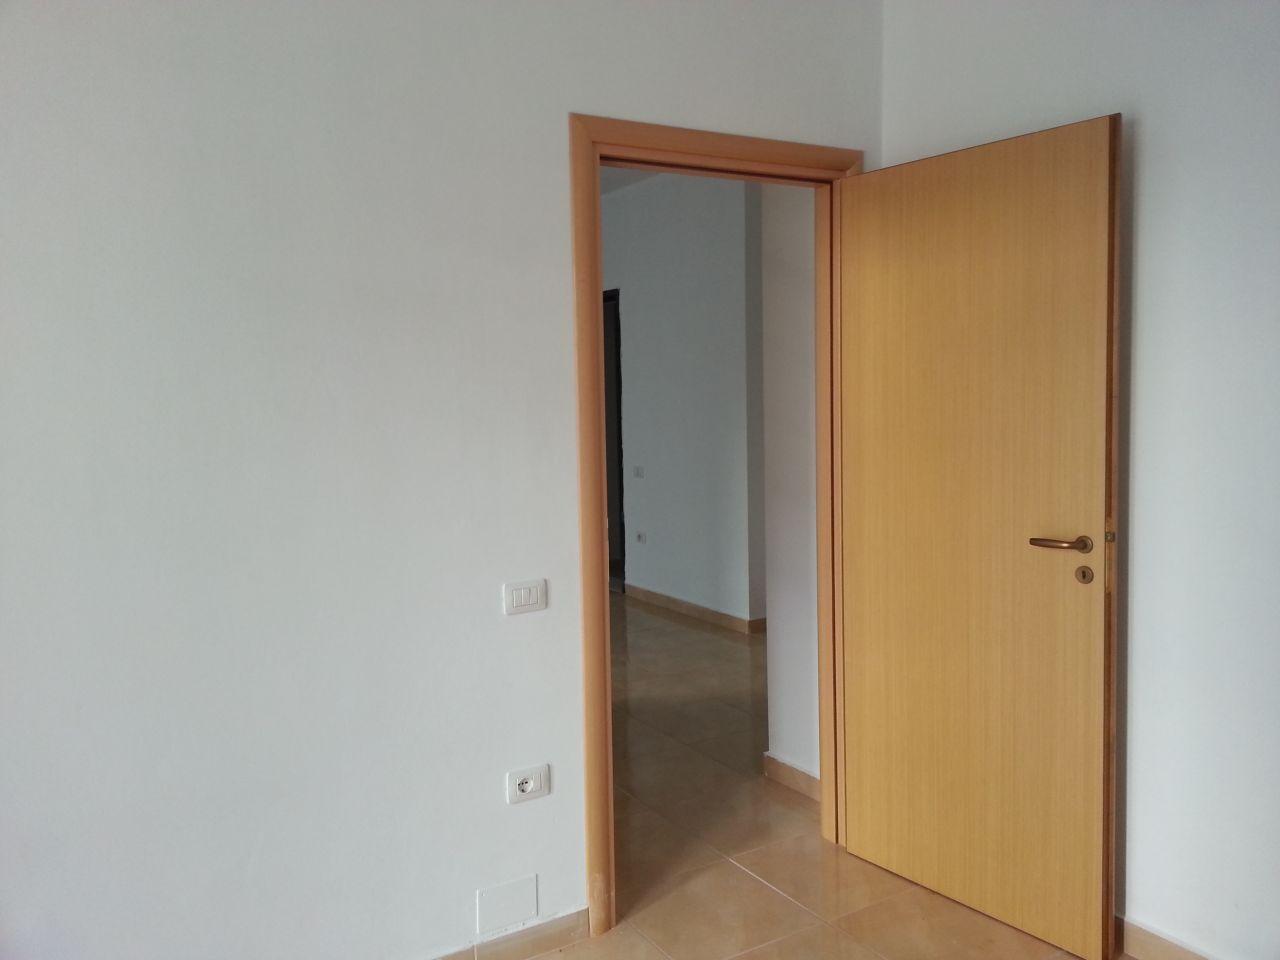 Price - 42 000 EURO, Apartment For Sale - 63 m2